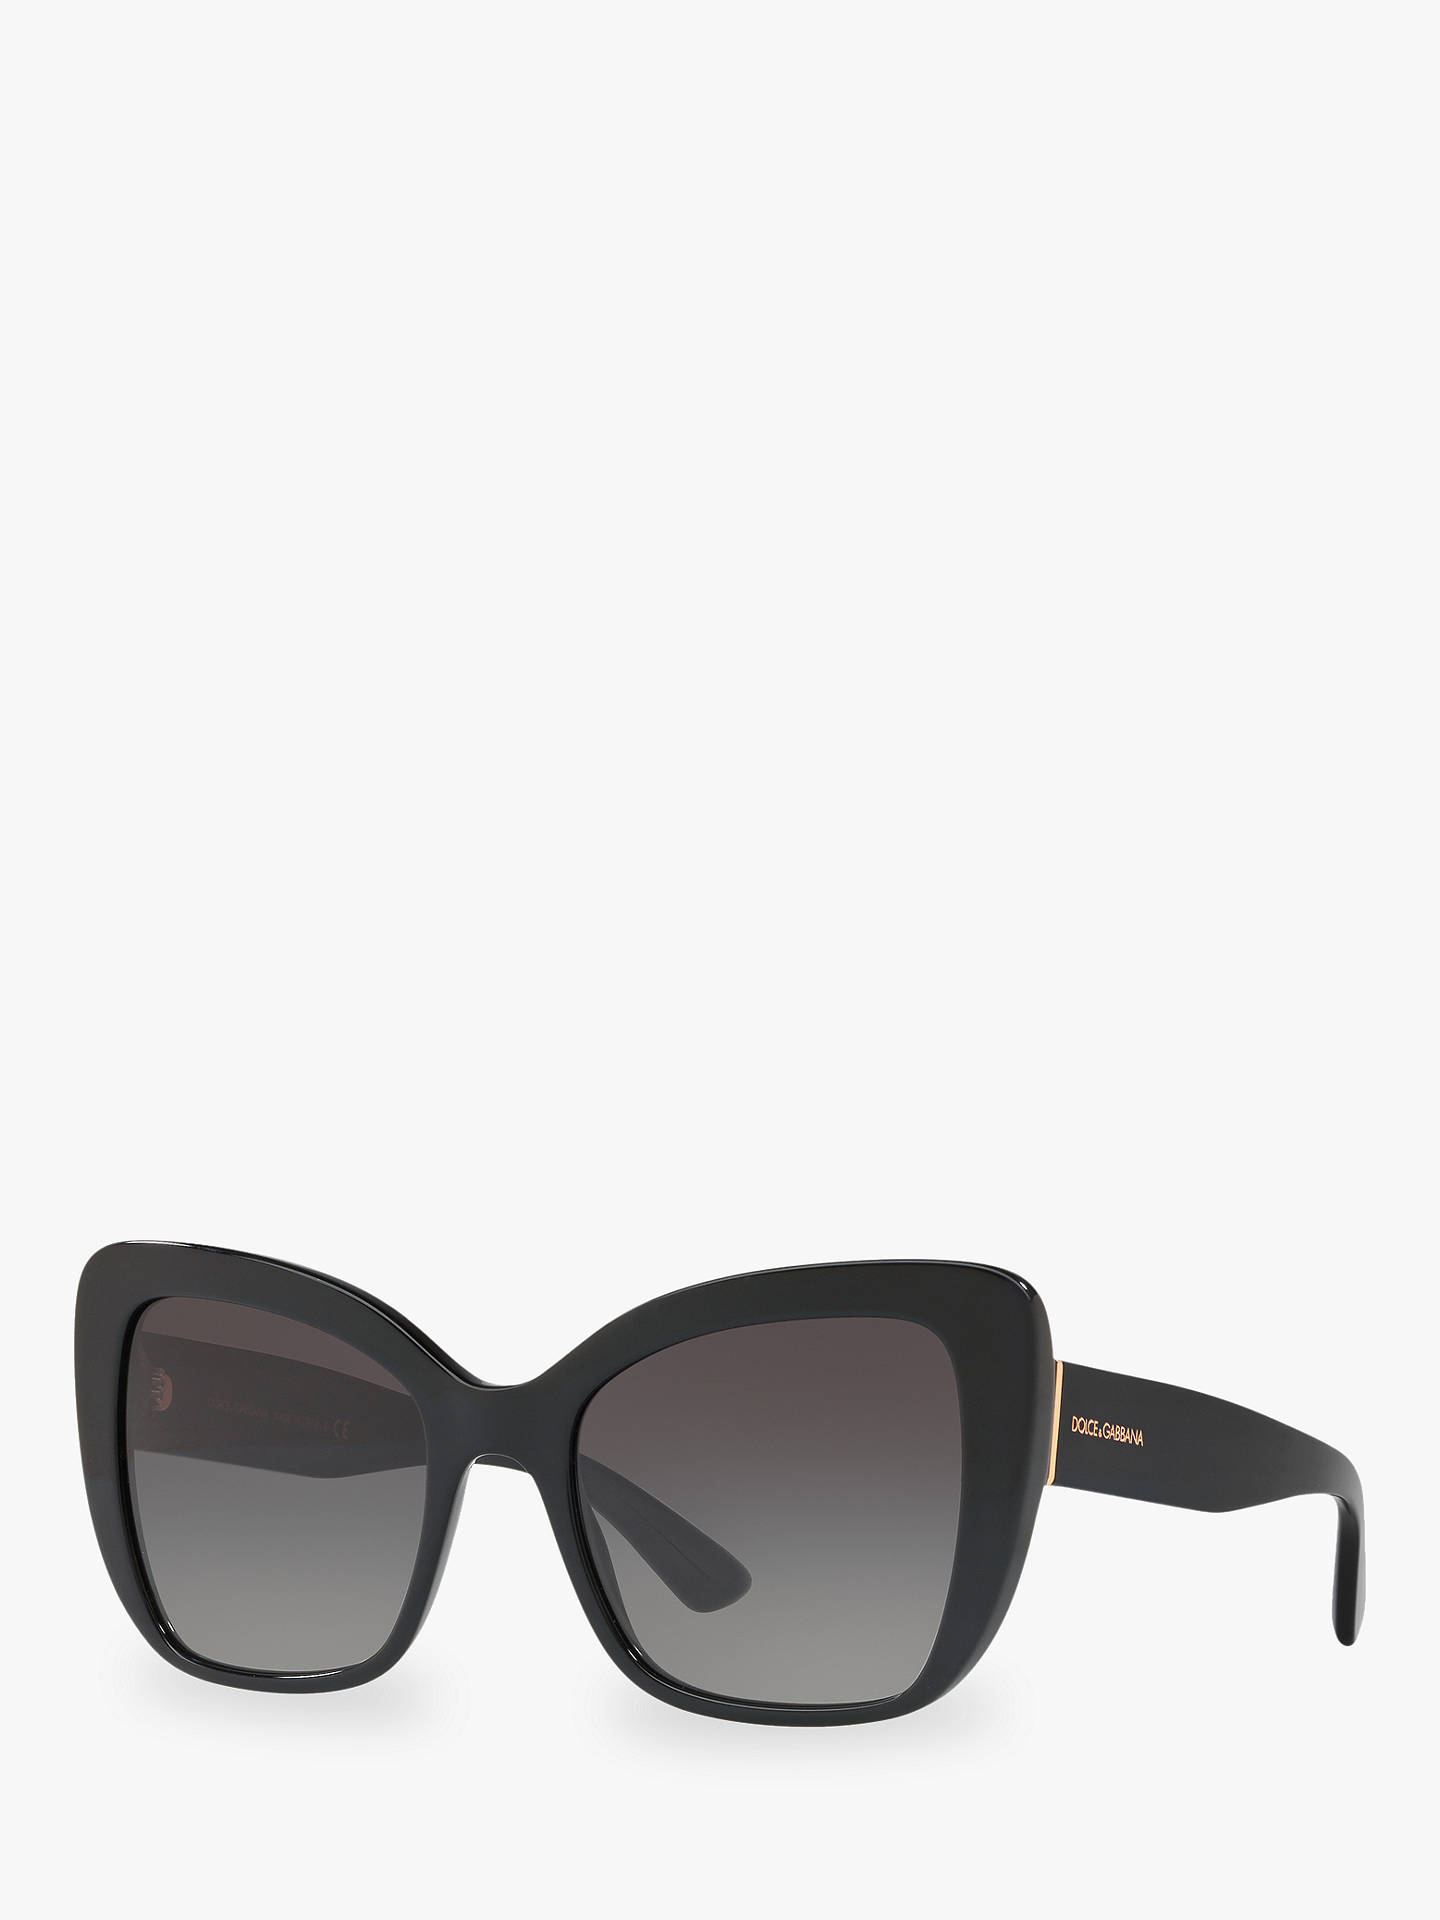 3d041b7a47 Buy Dolce & Gabbana DG4348 Women's Cat's Eye Sunglasses, Black/Grey  Gradient Online at ...